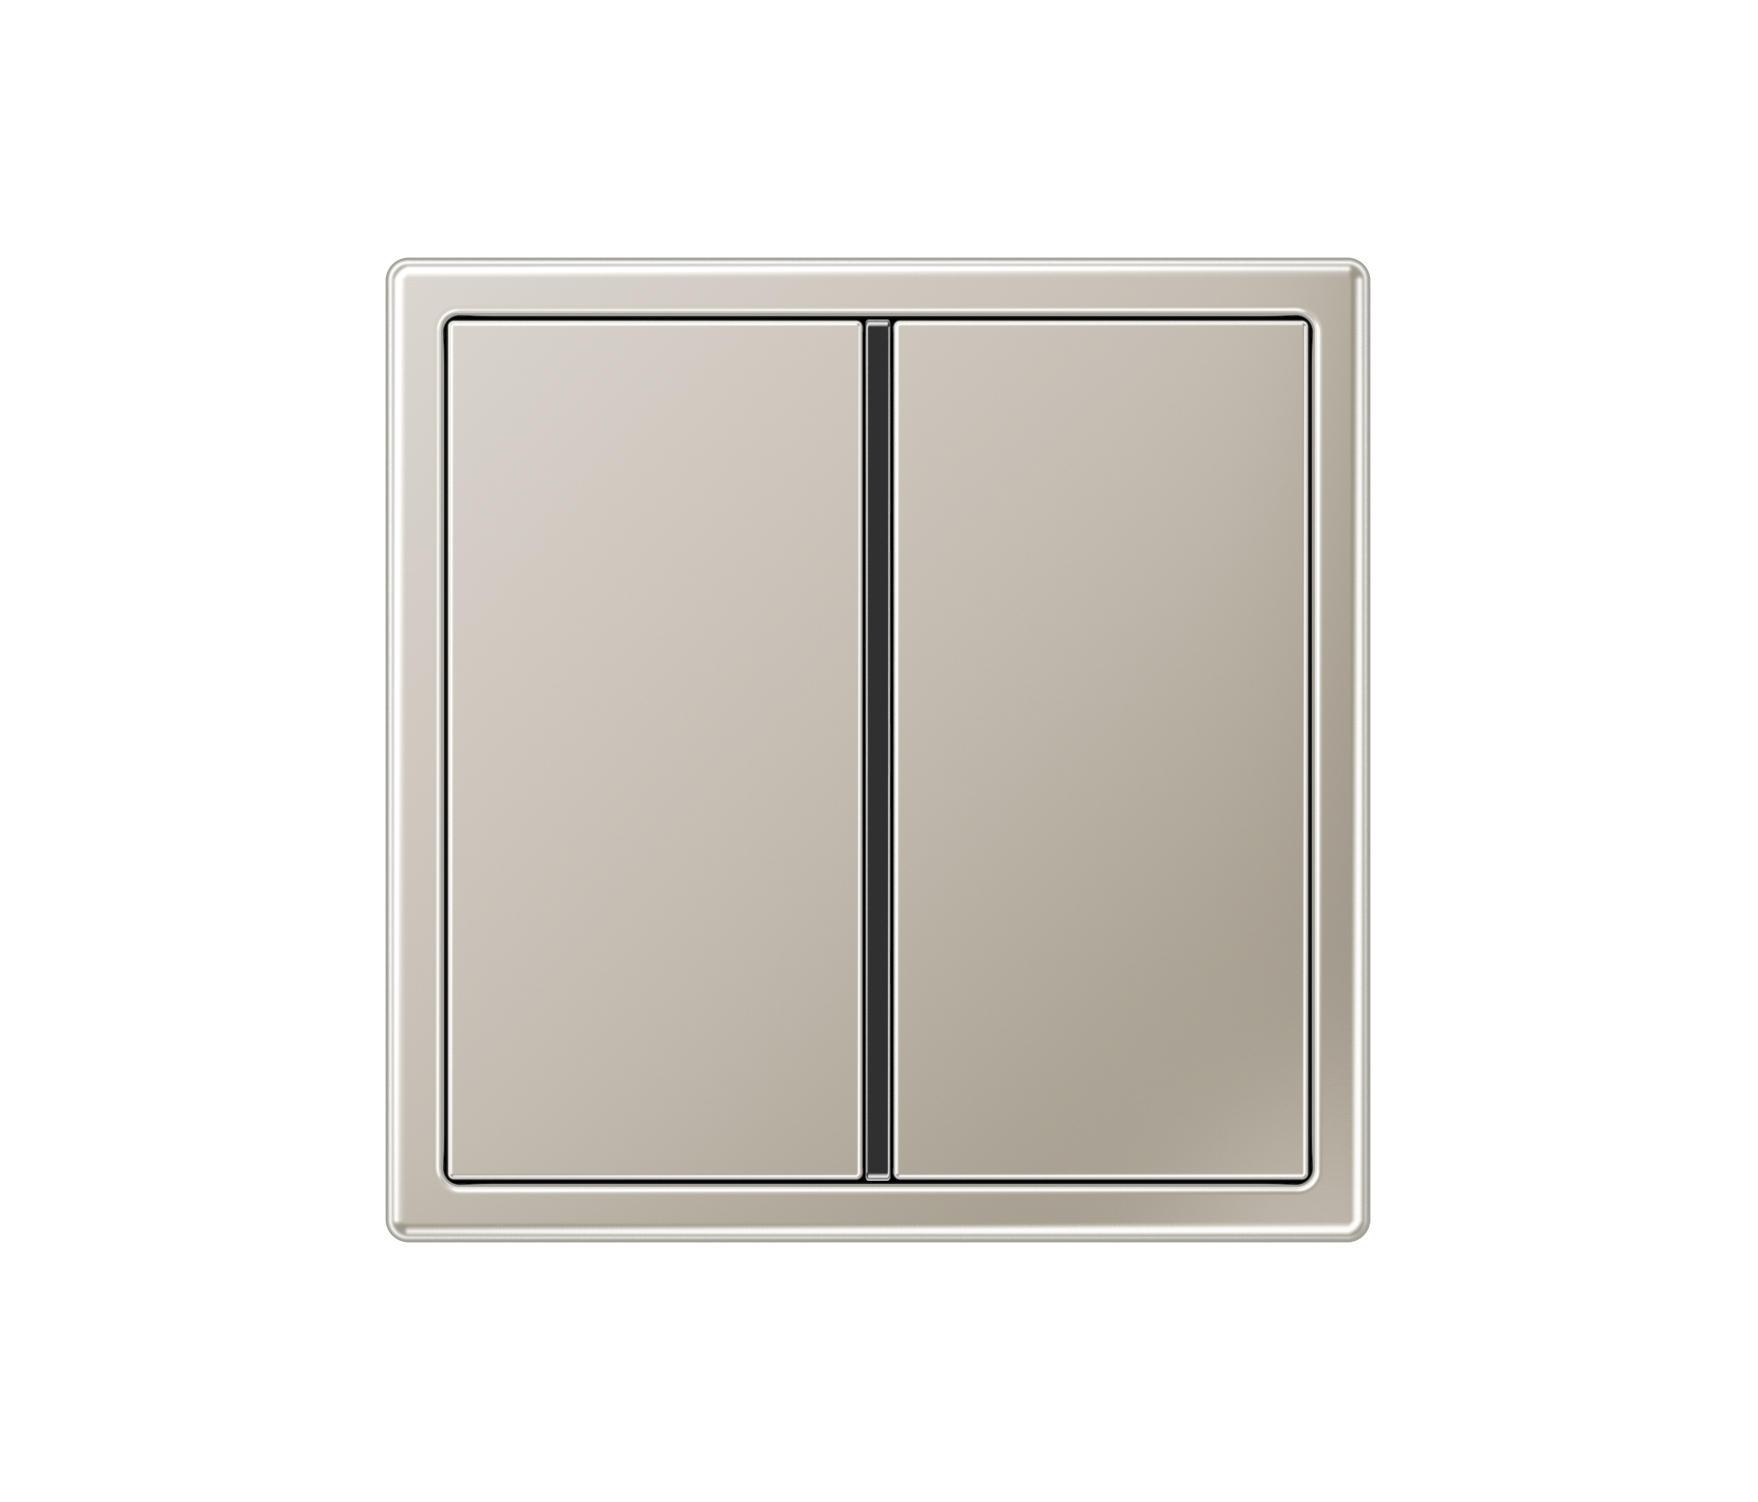 ls 990 stainless steel 2 range switch interrupteurs standard de jung architonic. Black Bedroom Furniture Sets. Home Design Ideas